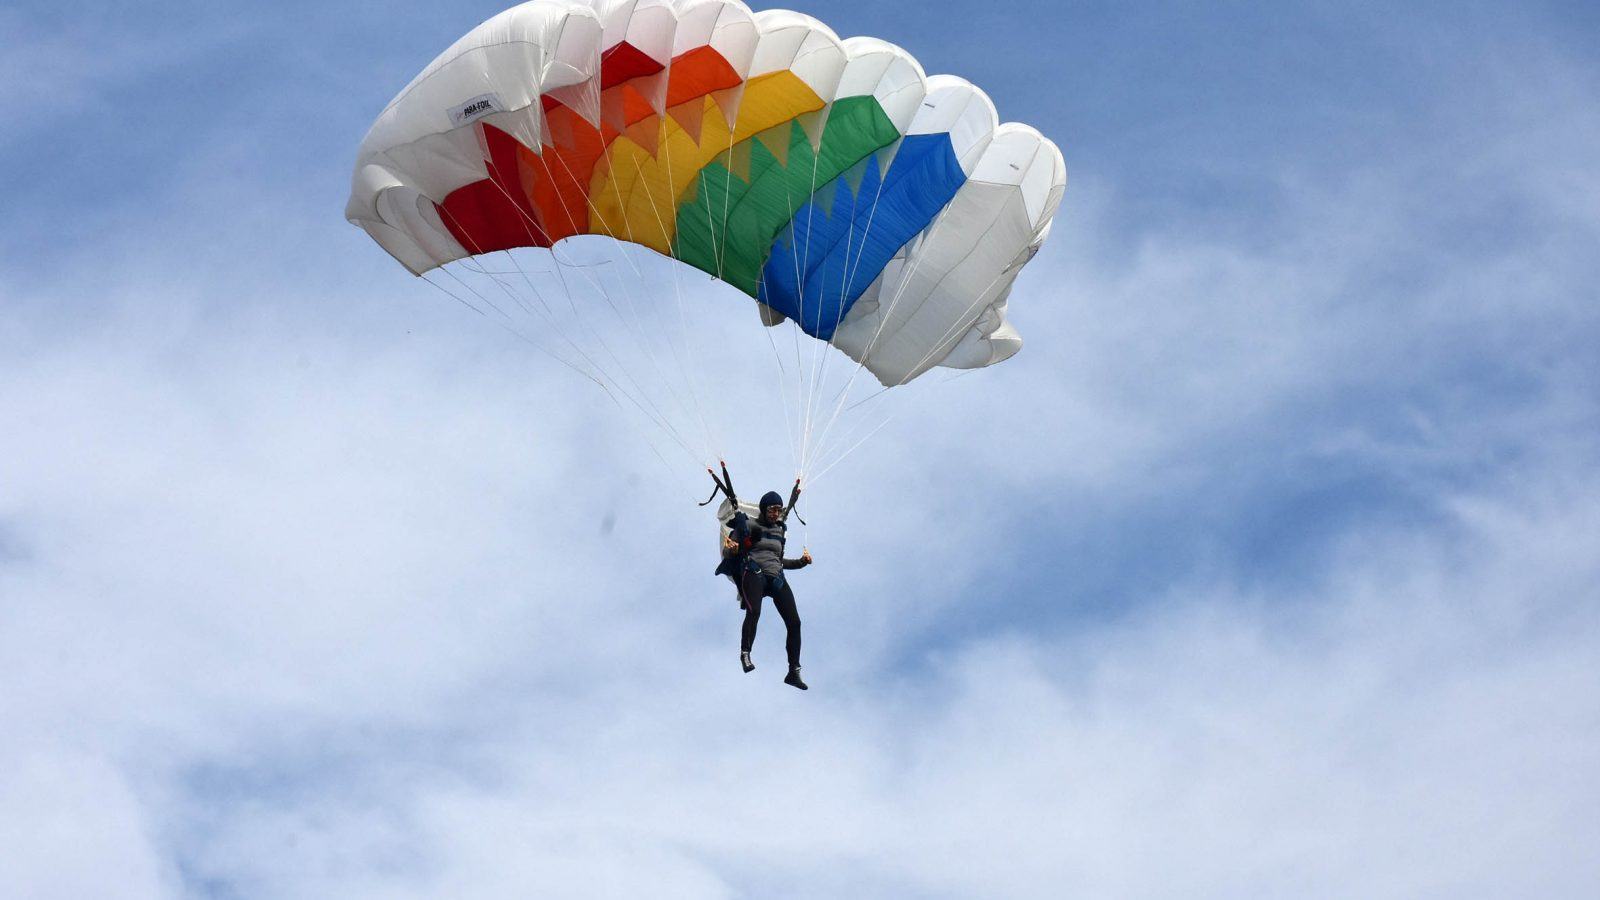 [NAJAVA] 67. Otvoreno padobransko prvenstvo Srbije 21. i 22. avgusta na aerodromu Ečka